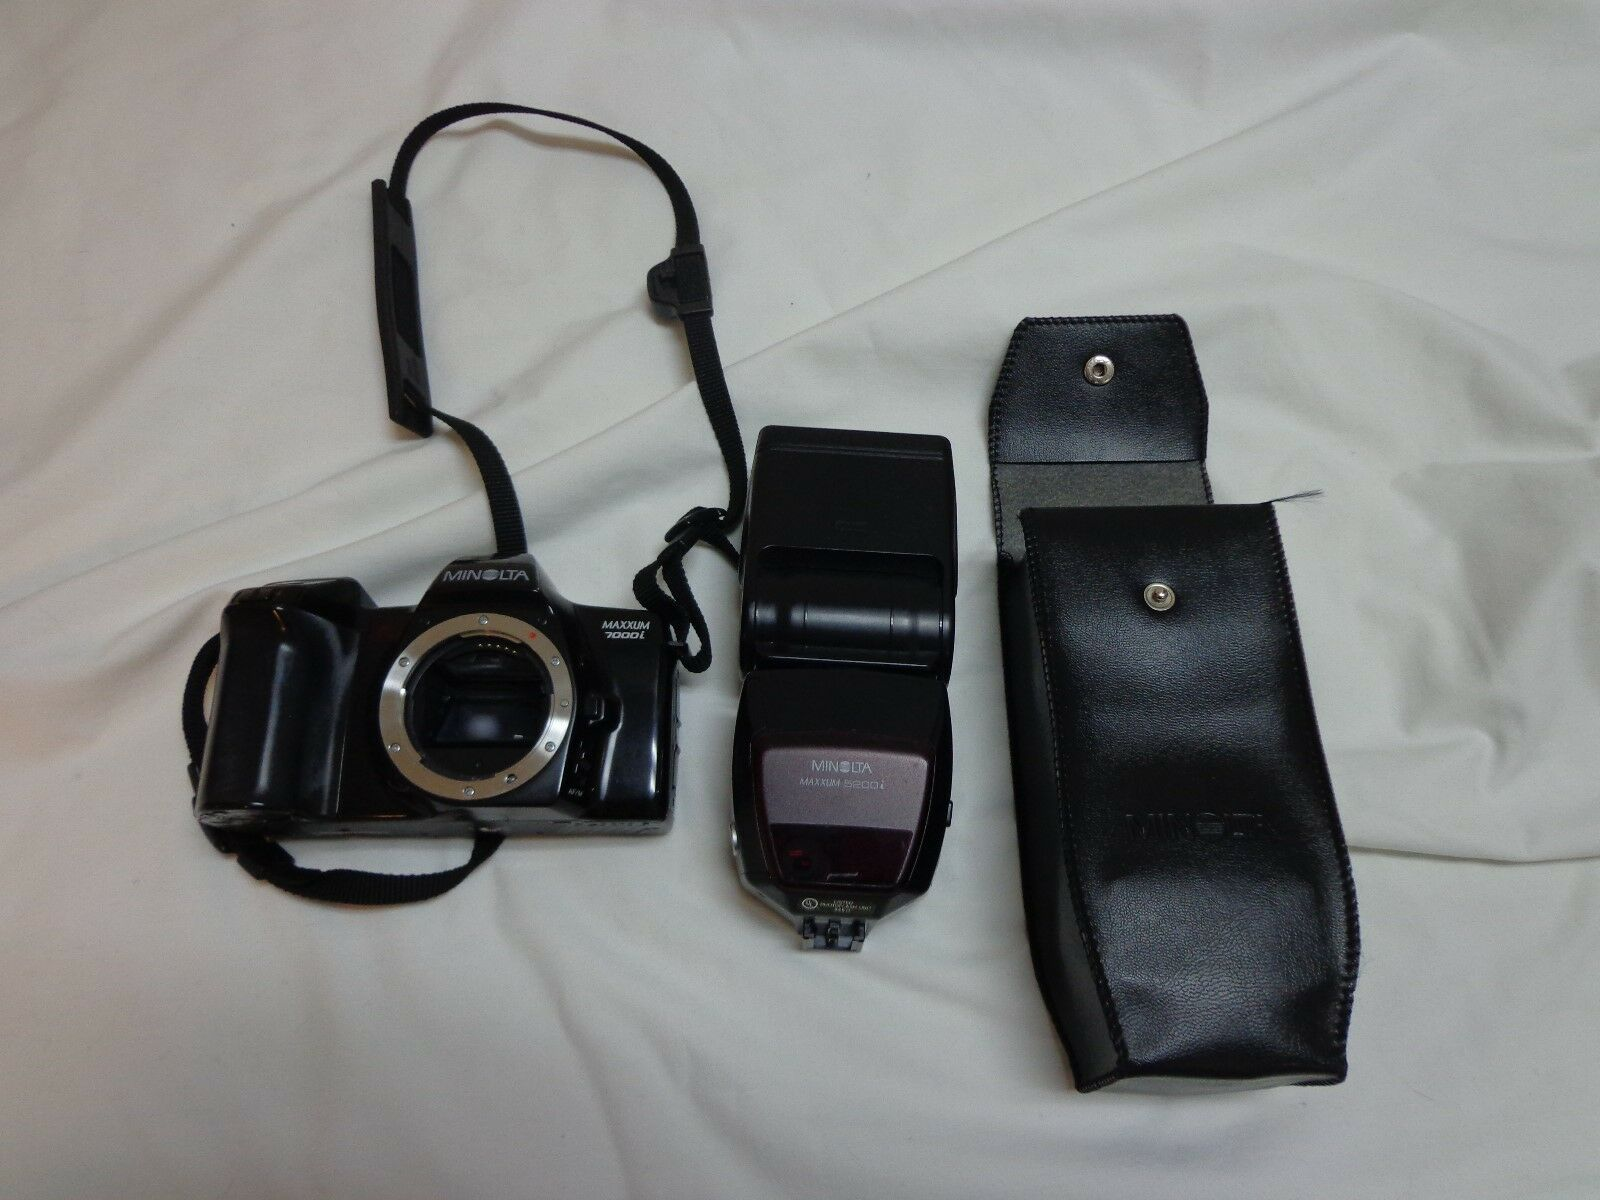 Minolta Maxxum 7000i 35mm Camera Body And 5200i Flash in Case -- Parts Only - $10.99